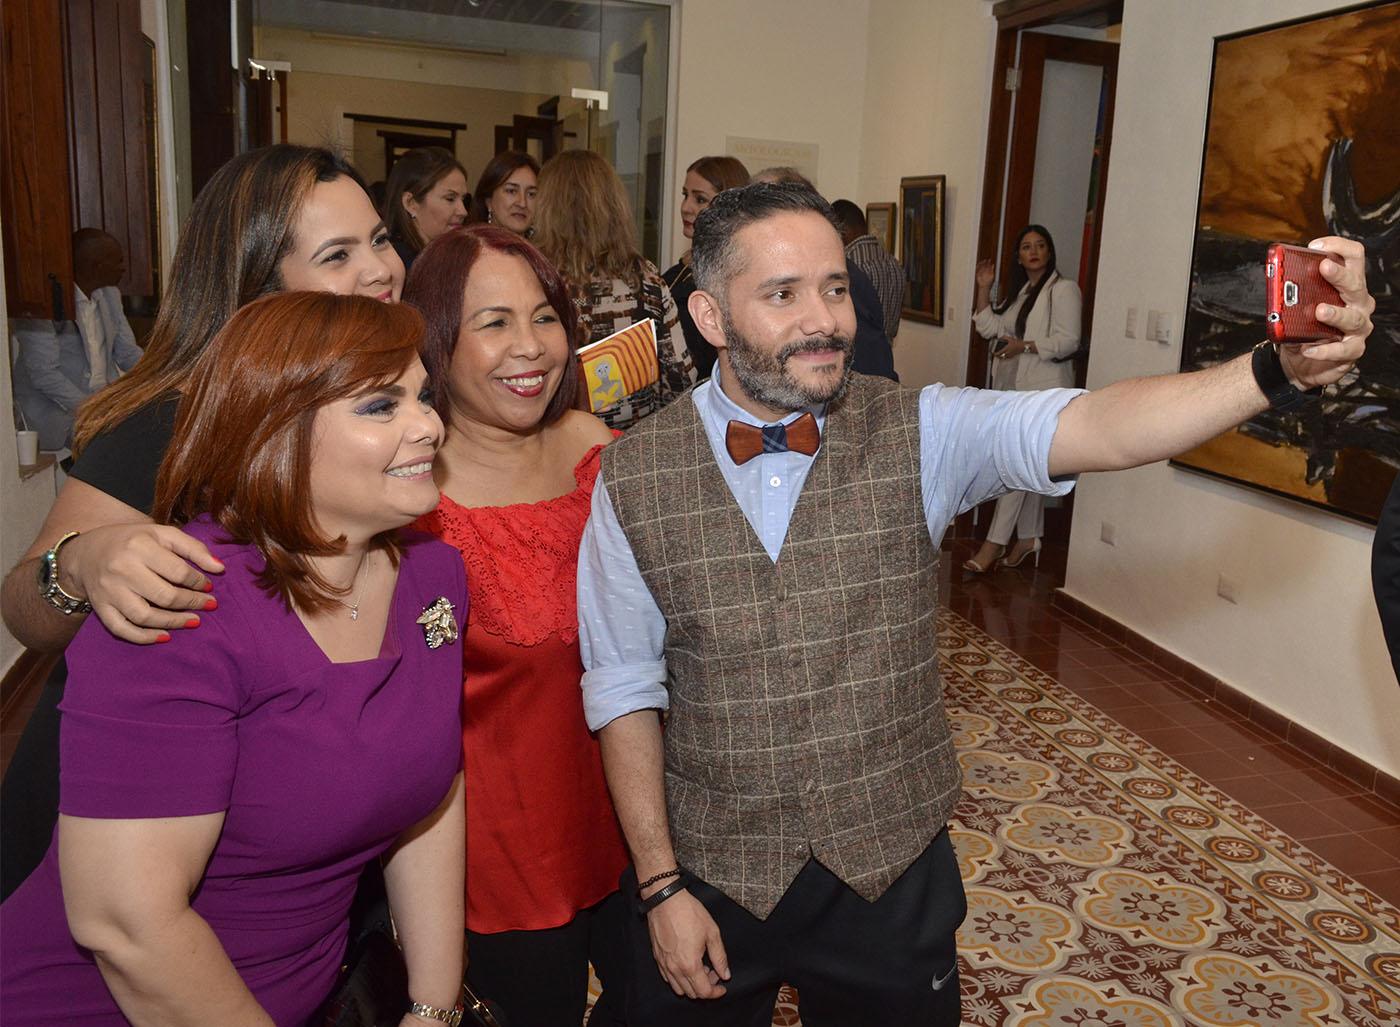 Selfie Pavel Núñez junto a Rommy Grullón, Marielle Araujo y Zoila Puello